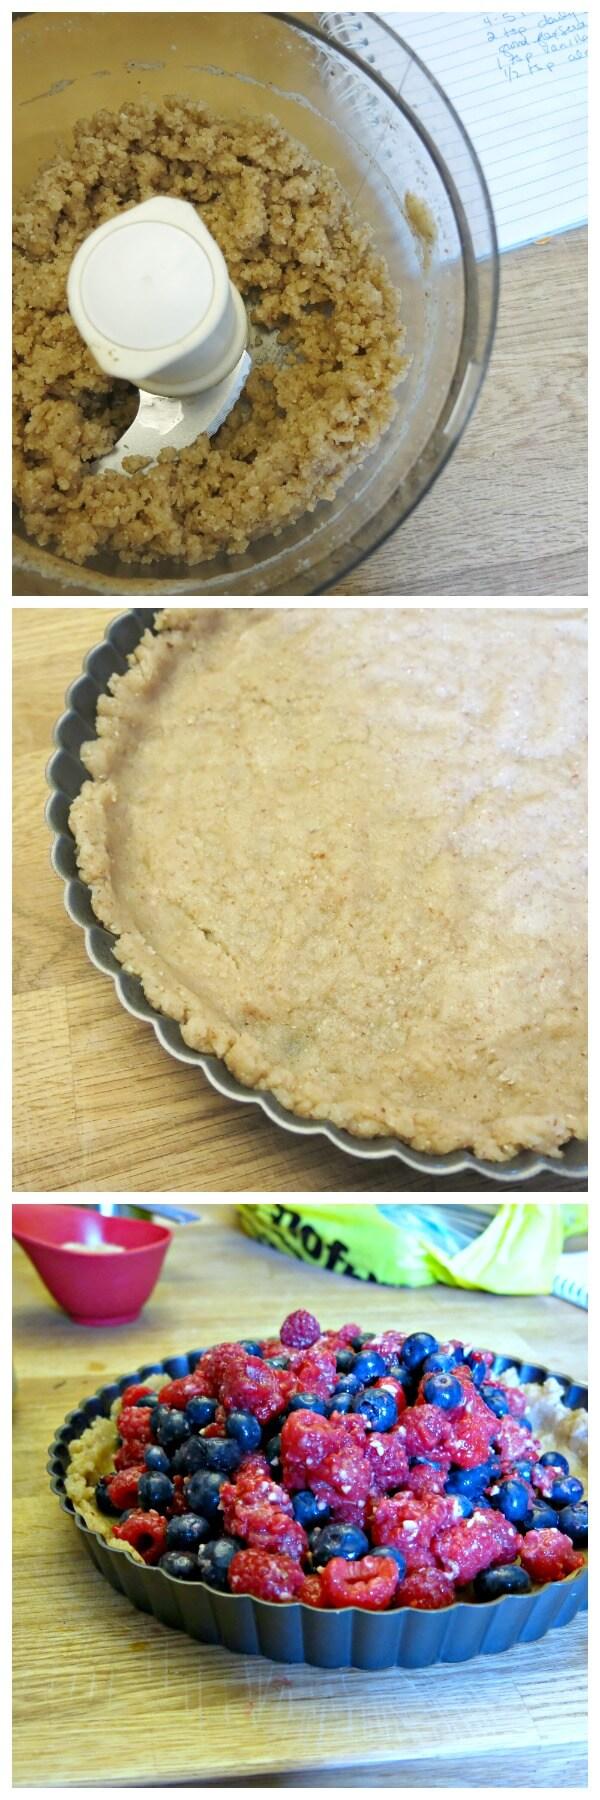 making vegan berry almond tart step by step